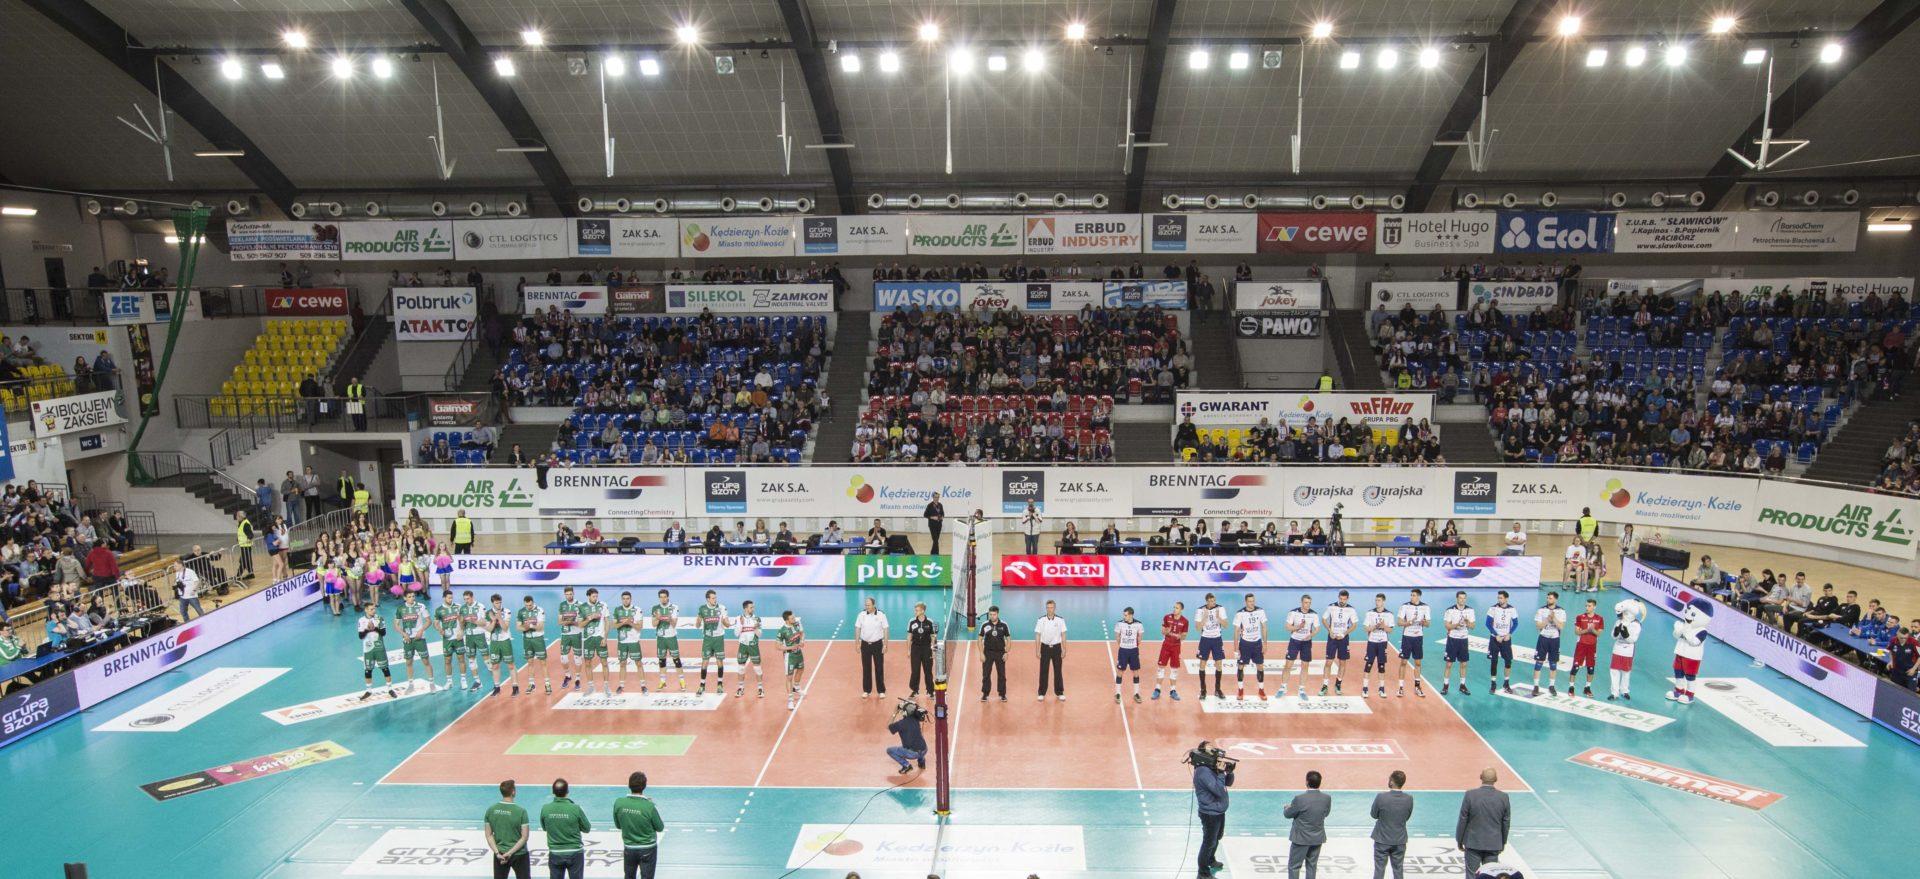 ZAKSA wygrywa z Indykpolem  AZS Olsztyn 3:0!